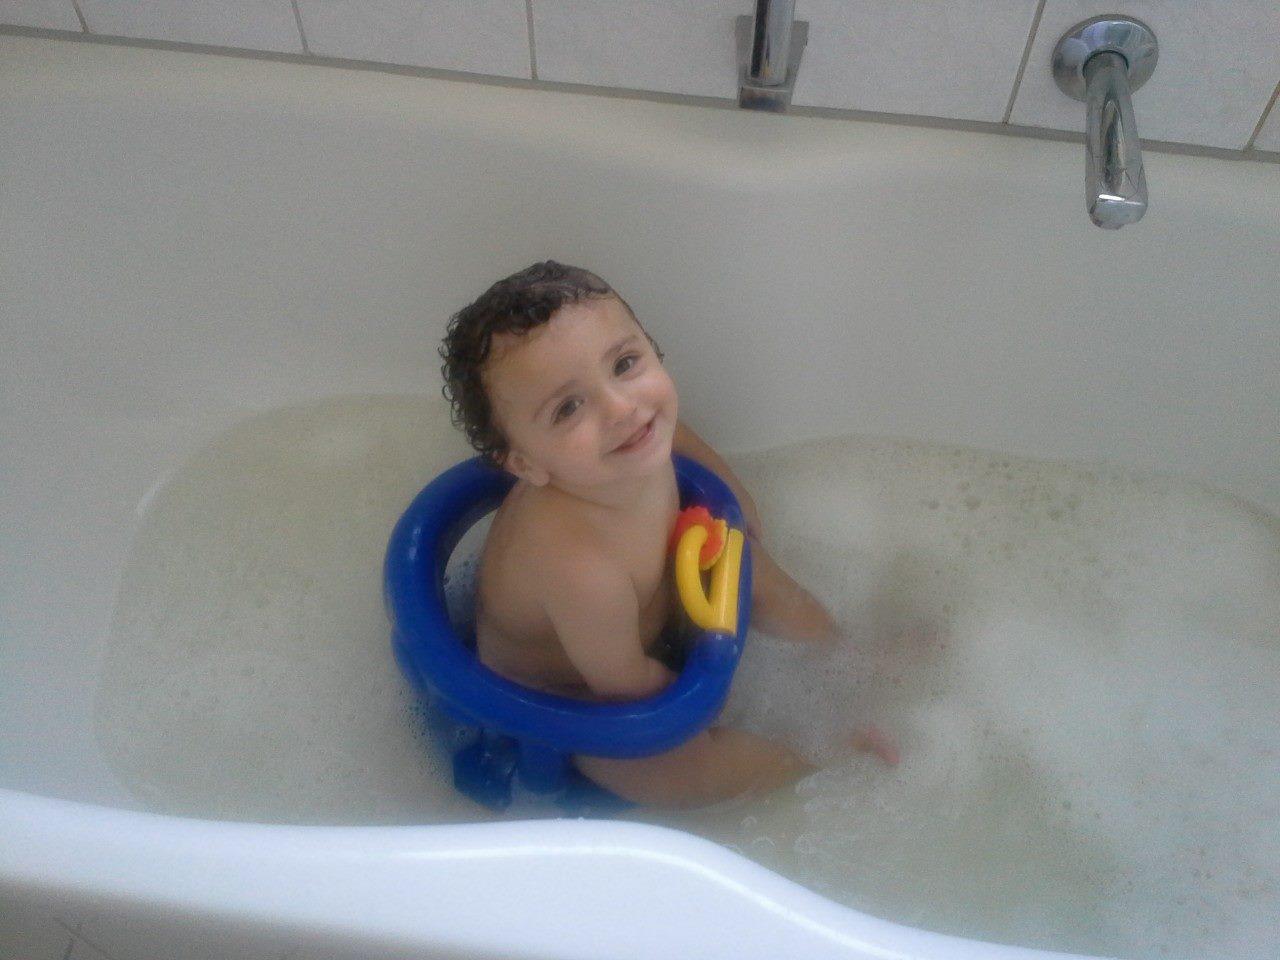 Vasca Da Bagno Per Neonati : Vasca da bagno neonati: vaschetta bagno neonato 【 sconti marzo